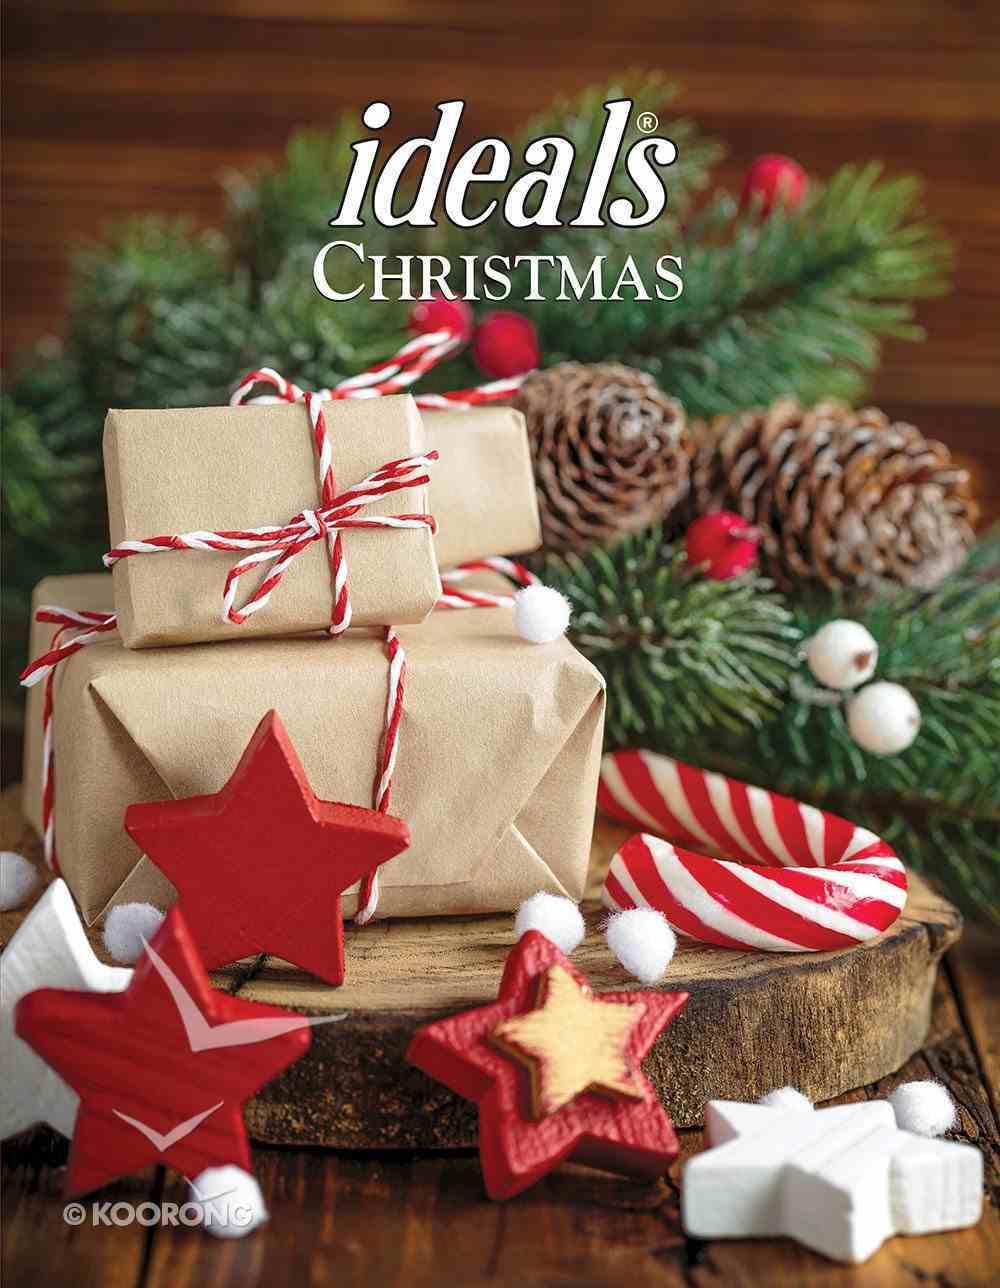 Christmas Ideals 2018 Paperback